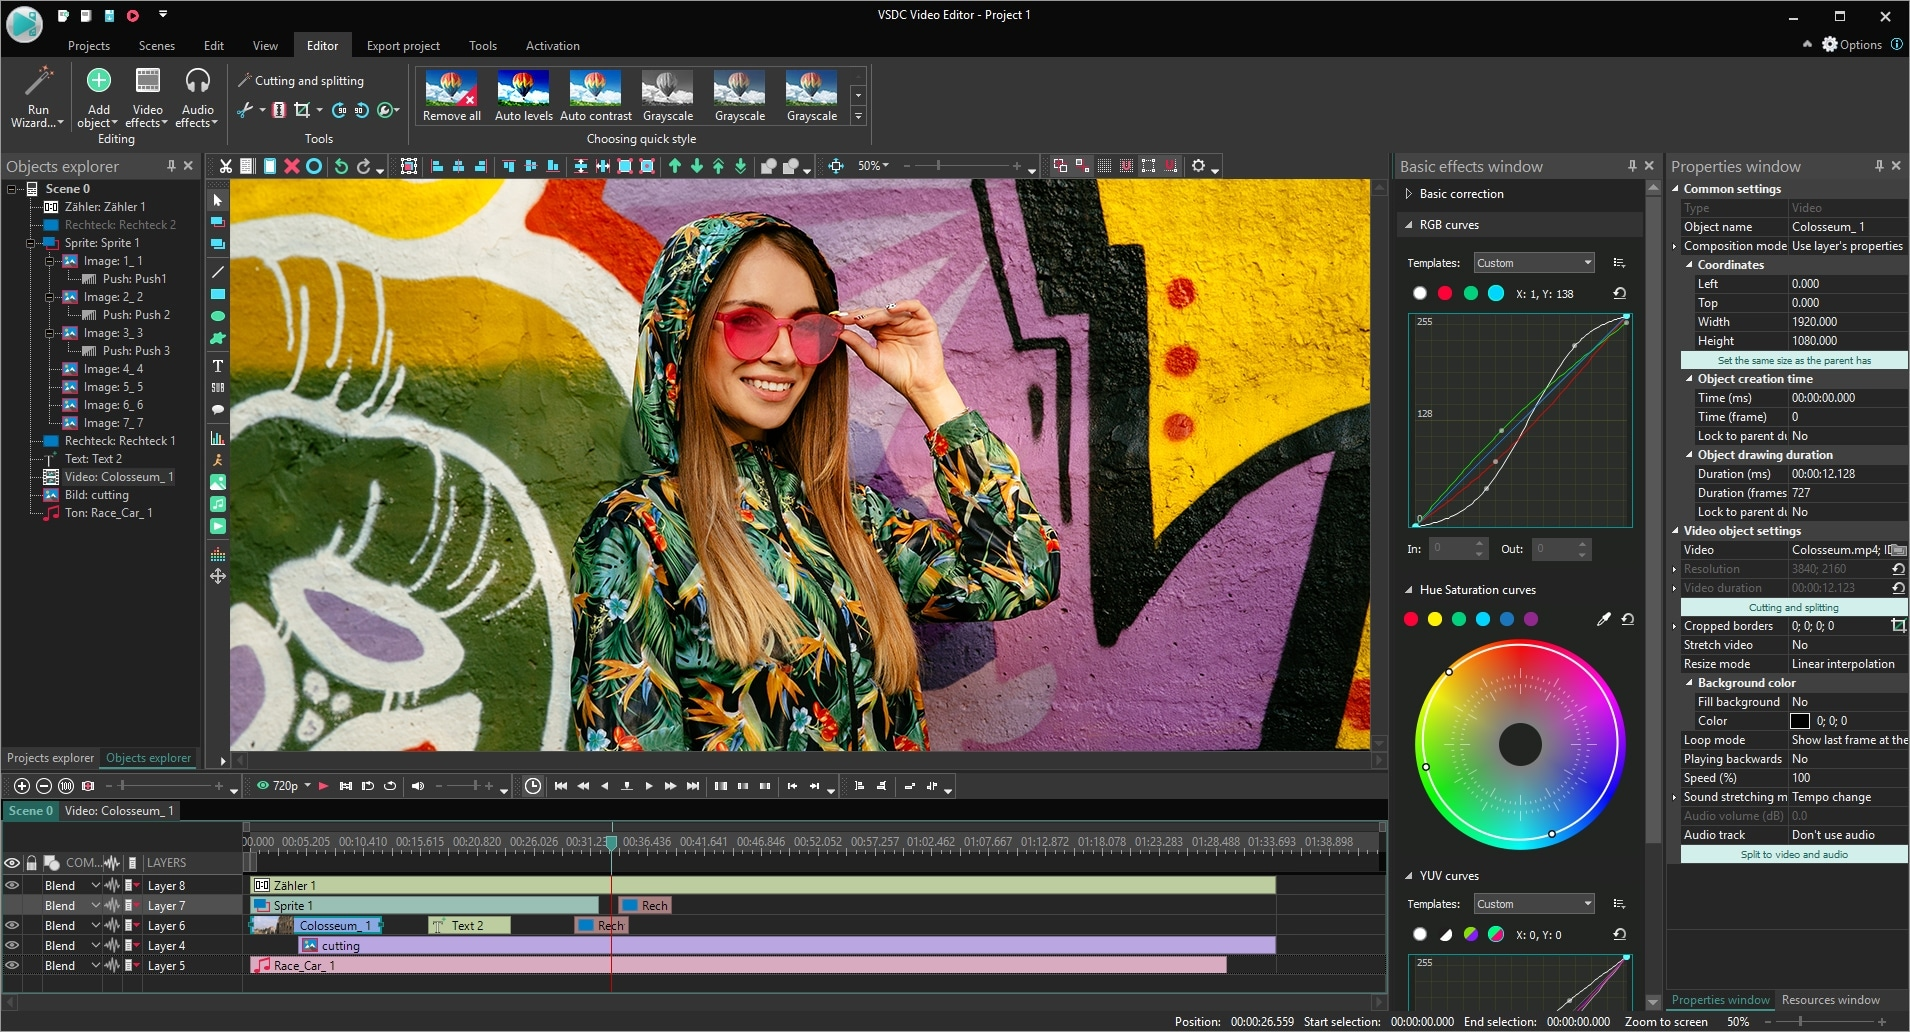 VSDC Pro Video Editor Lifetime License, Video Editing Software Screenshot